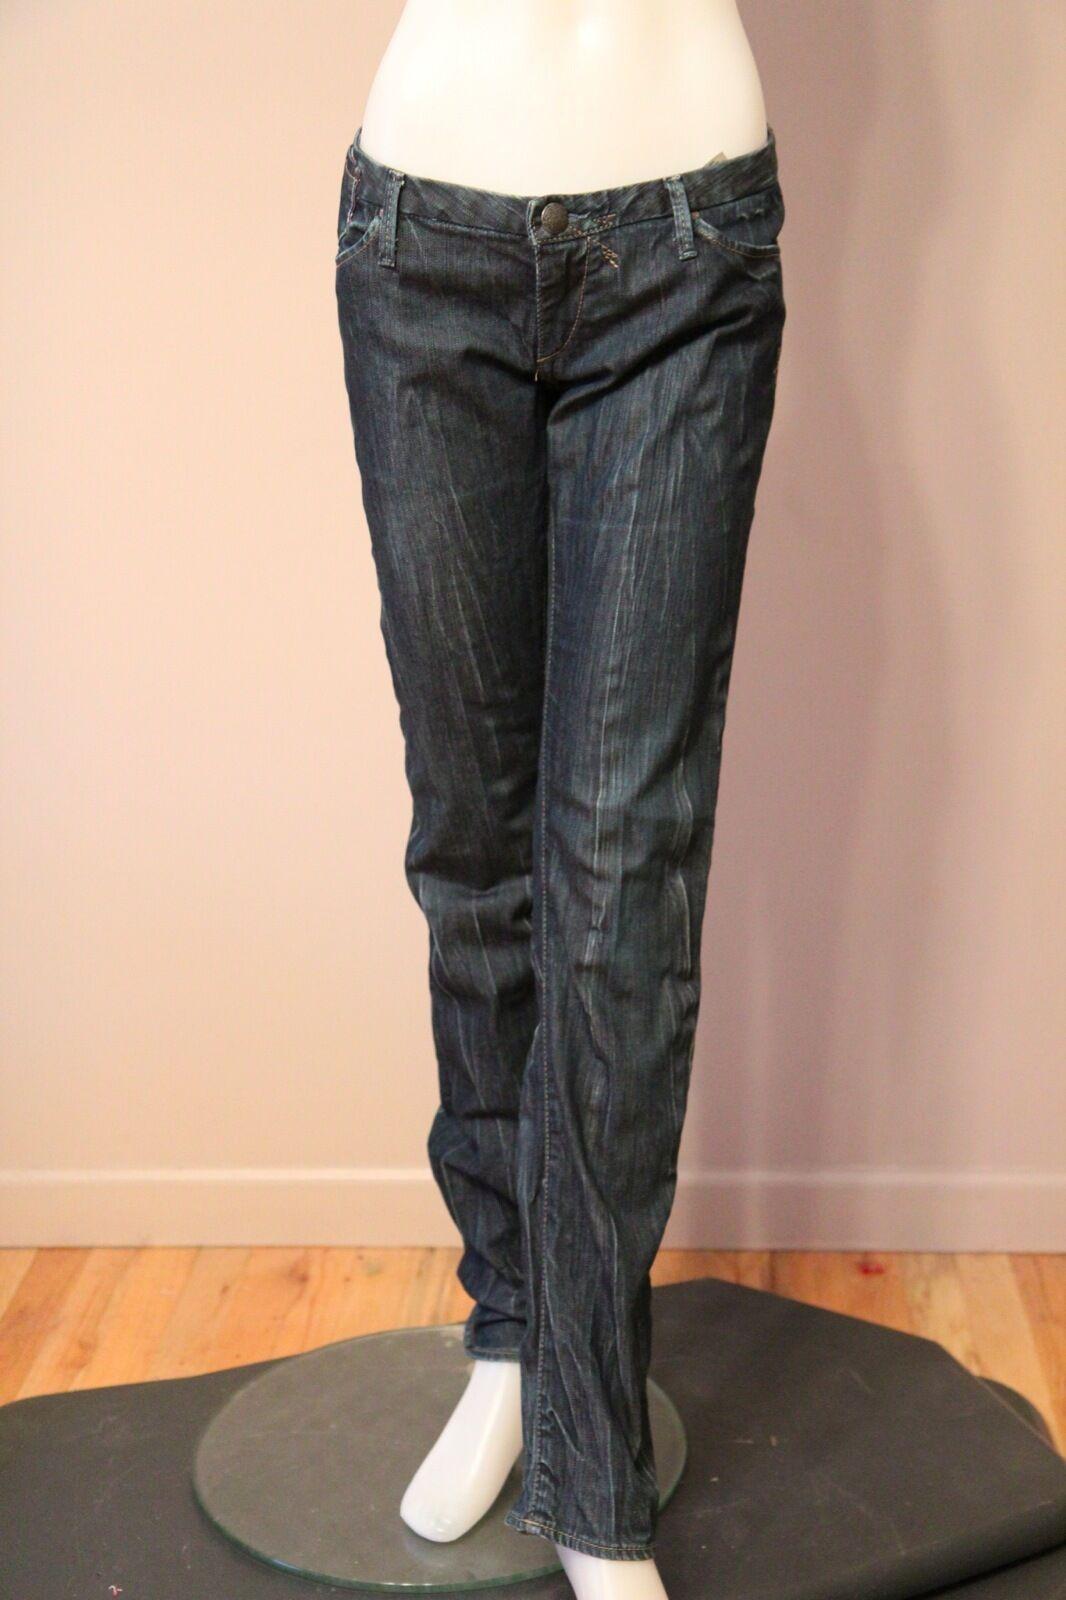 Union Womens Skinny Jeans size 31